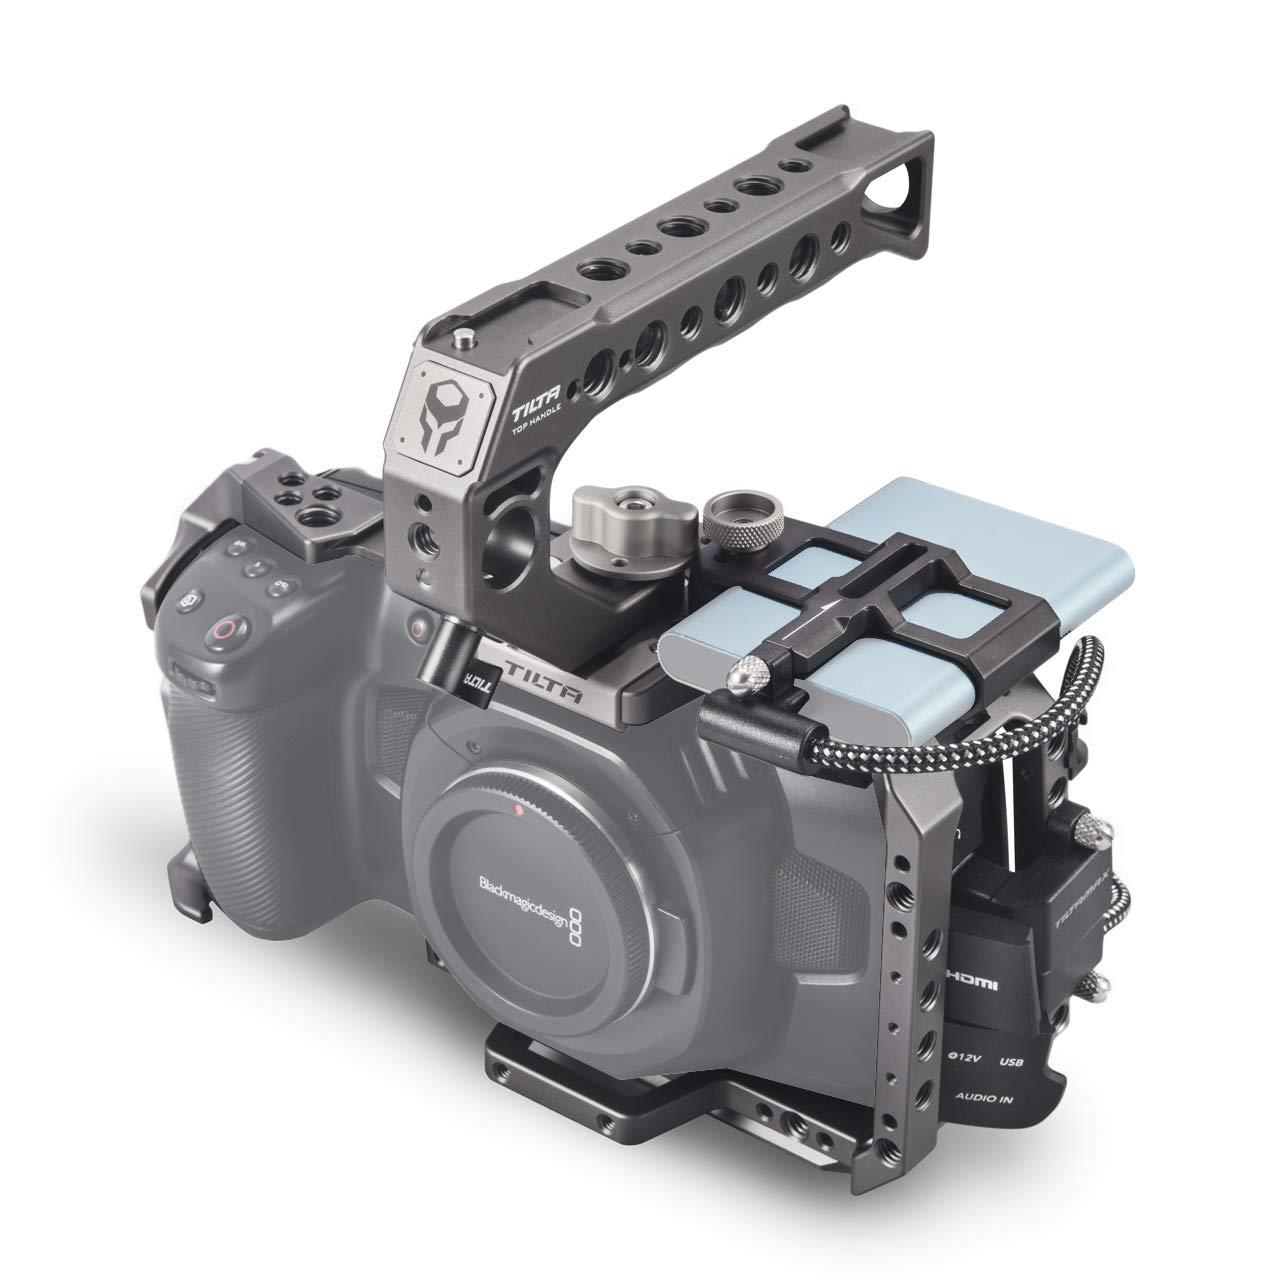 (Tilta Gray) TILTA TA-T01-B-G BMPCC 4K Cage Blackmagic Pocket Cinema Camera 4K Rig (Basic Kit) by Tilta